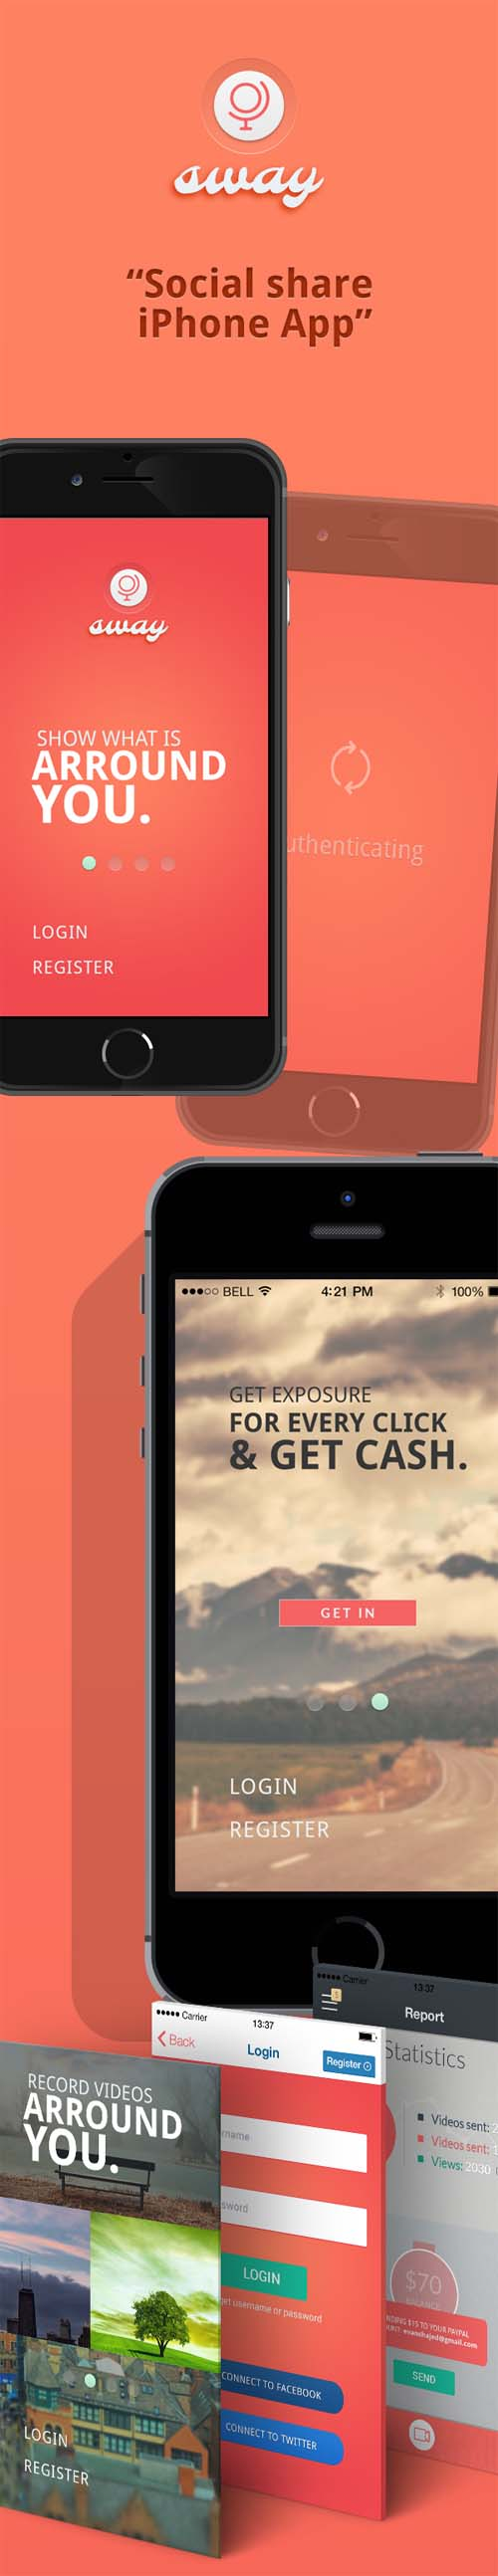 friday-mobile-ui-app-design-13-03-1-1